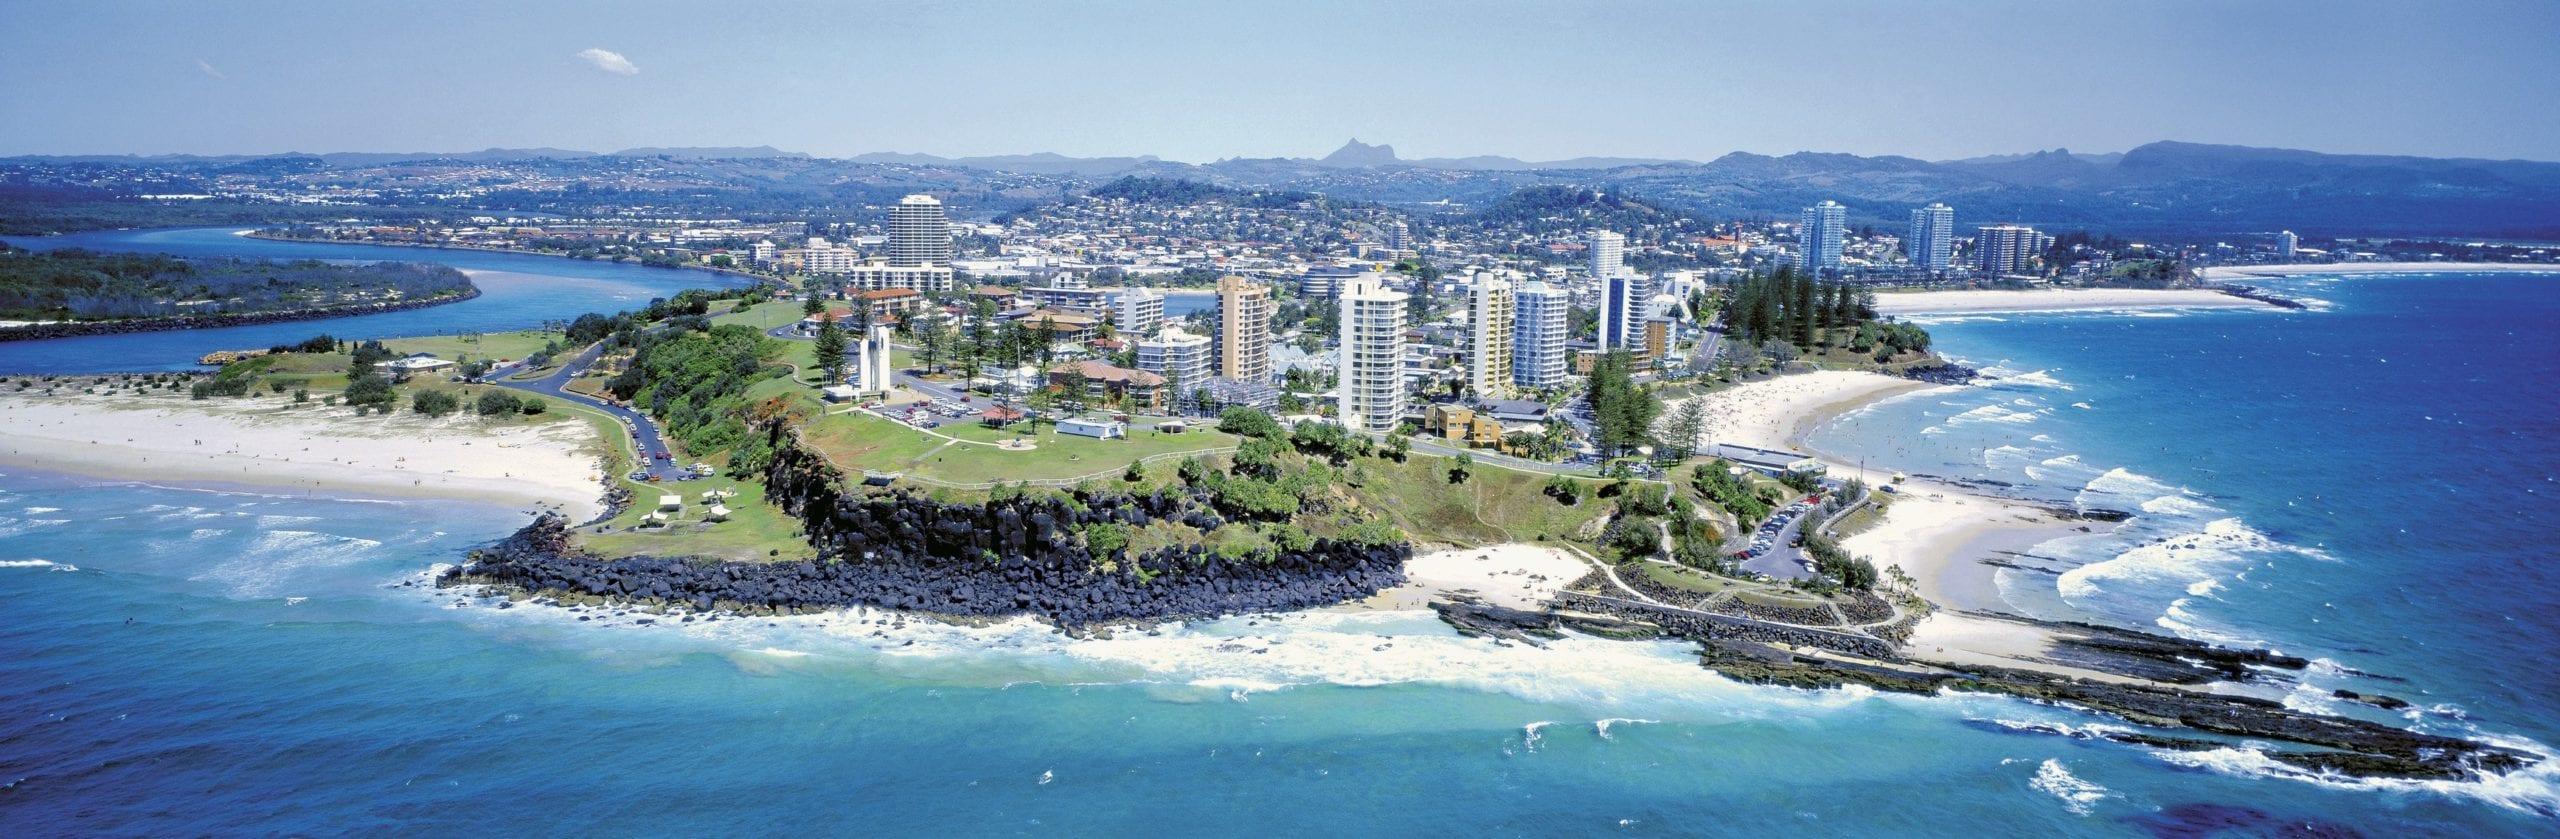 Queensland, Australia - Lonely Planet